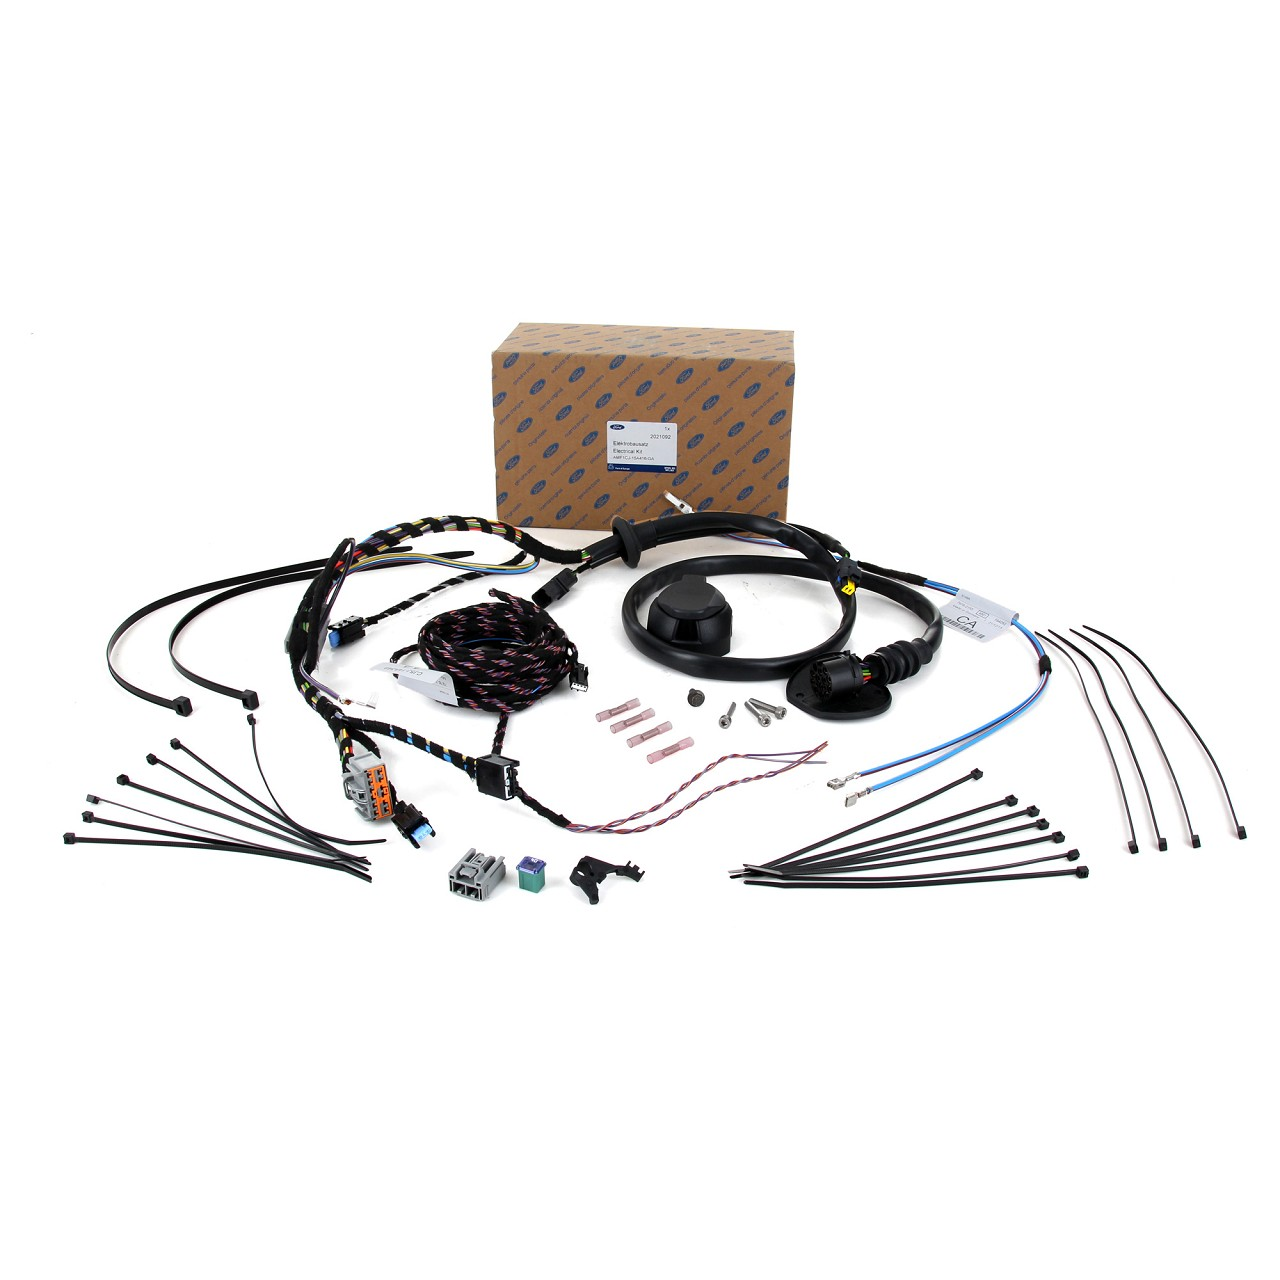 ORIGINAL Ford E-Satz Kabelsatz Anhängerkupplung GRAND / C-MAX II 13-pol. 2021092